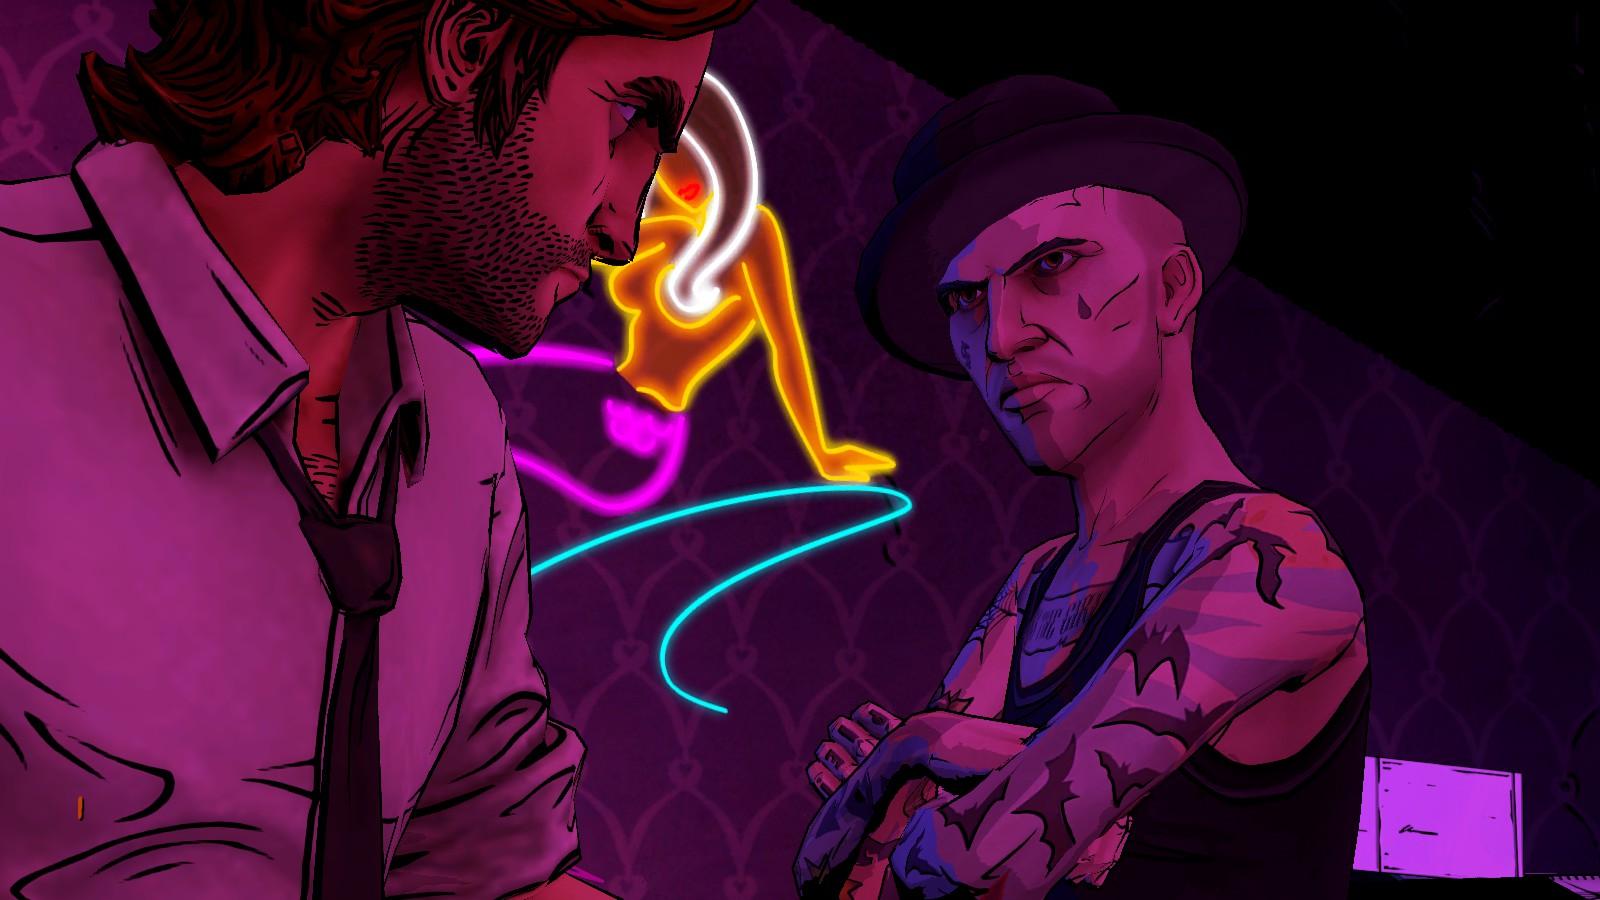 wolf_among_us_smoke_and_mirrors_header_3